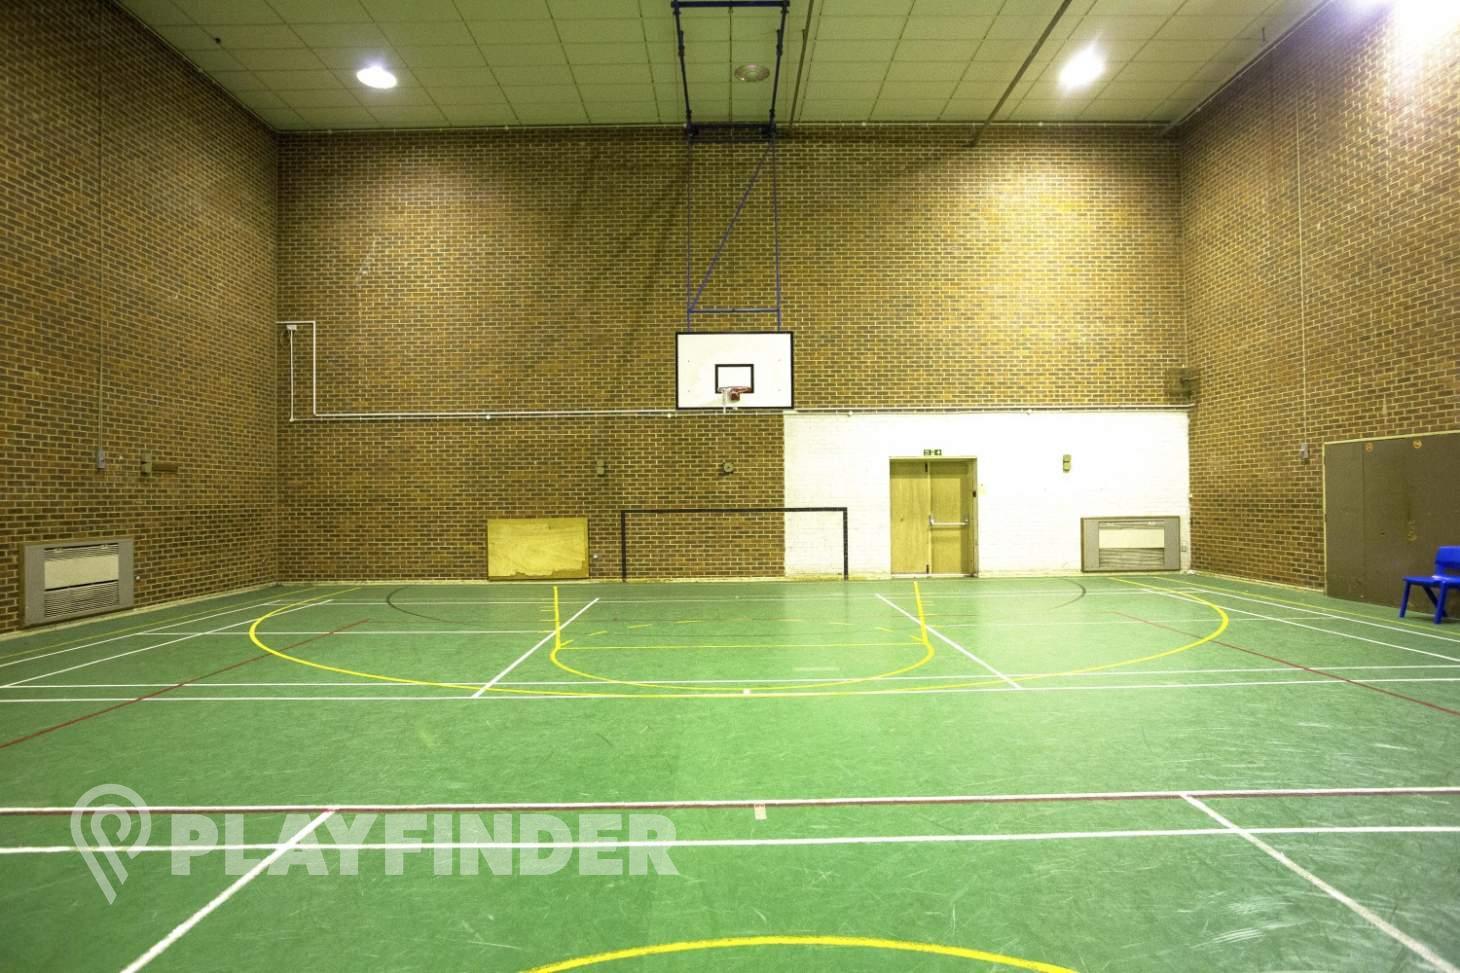 Christ's College Finchley Indoor   Hard badminton court